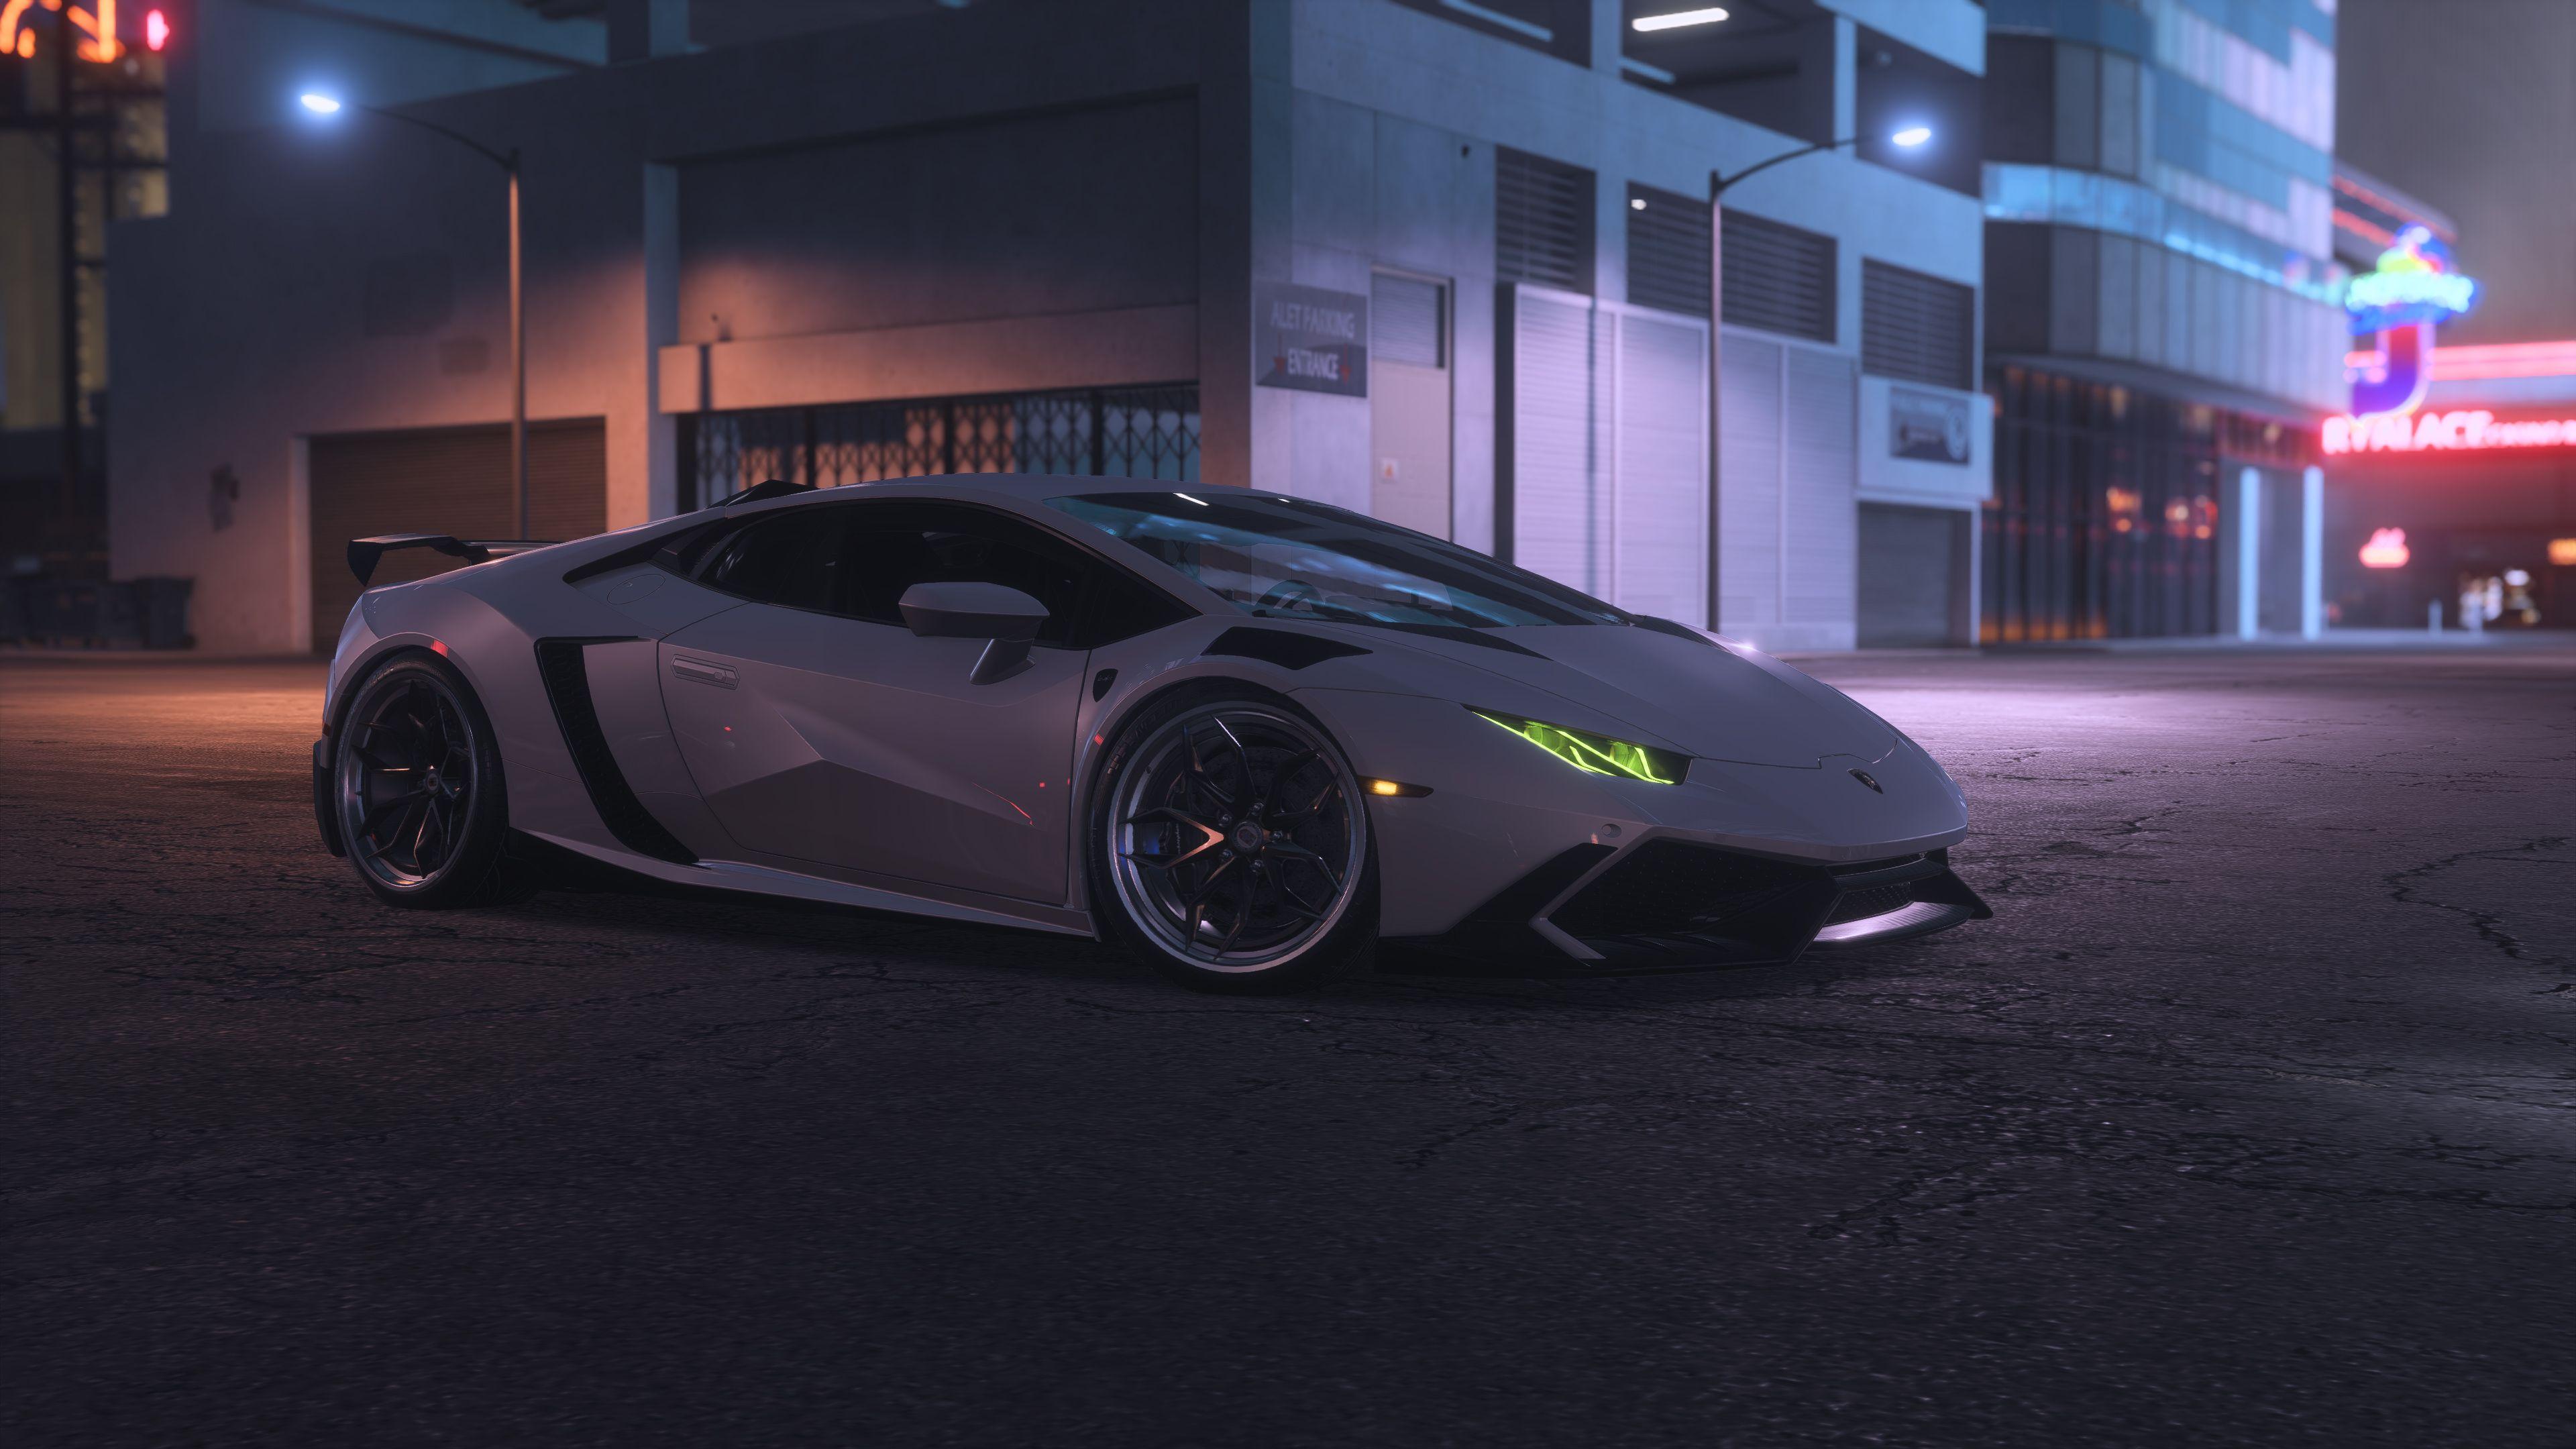 Wallpaper 4k Need For Speed Payback Lamborghini Hurcacan 4k 2018